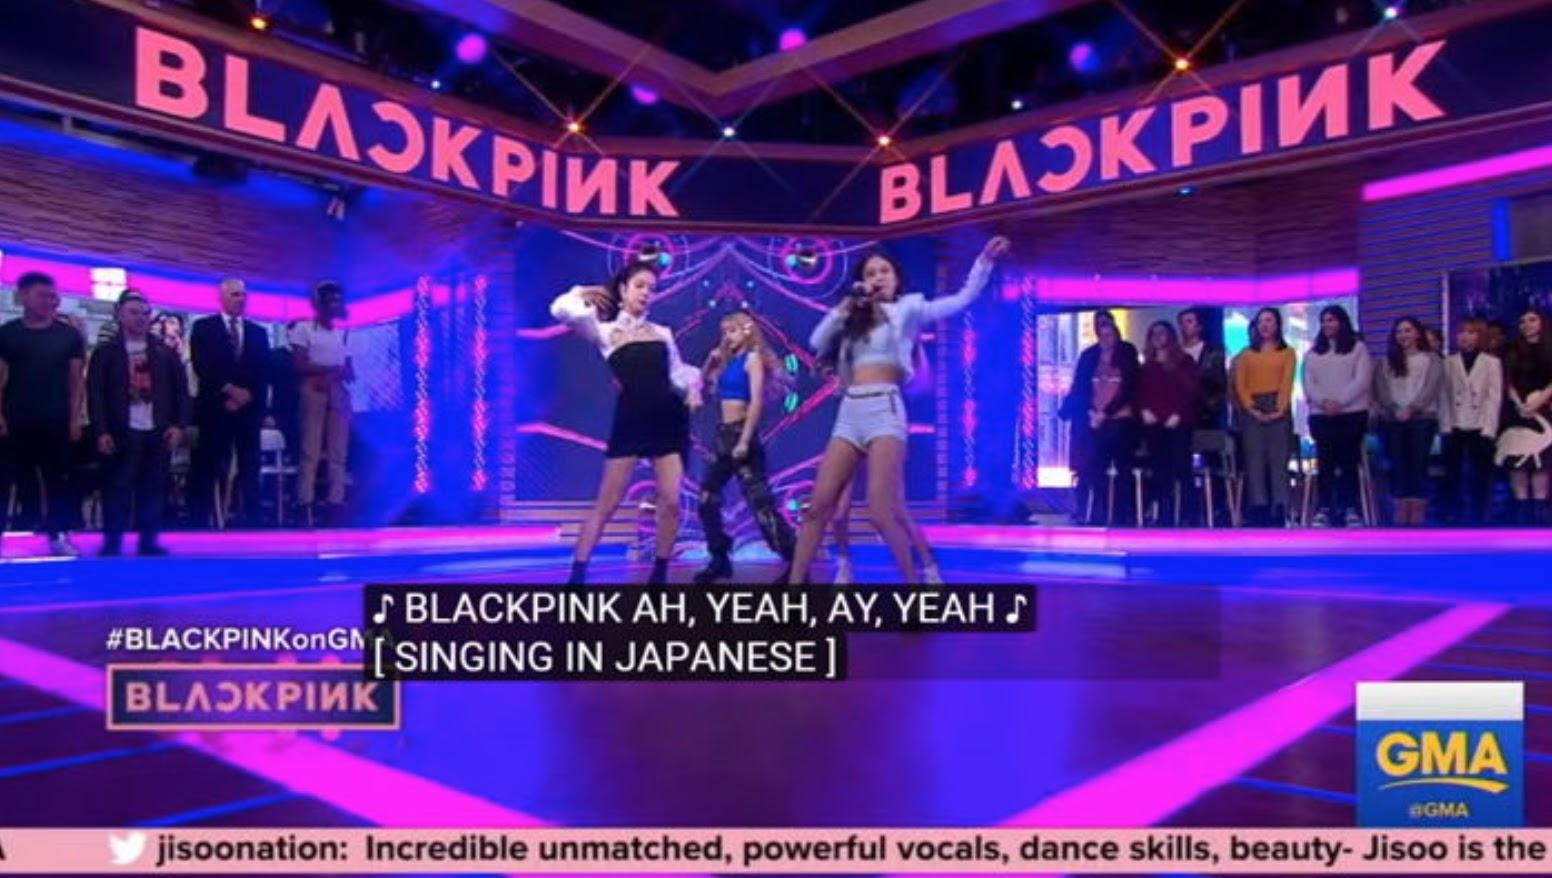 BLACKPINKJapanese2